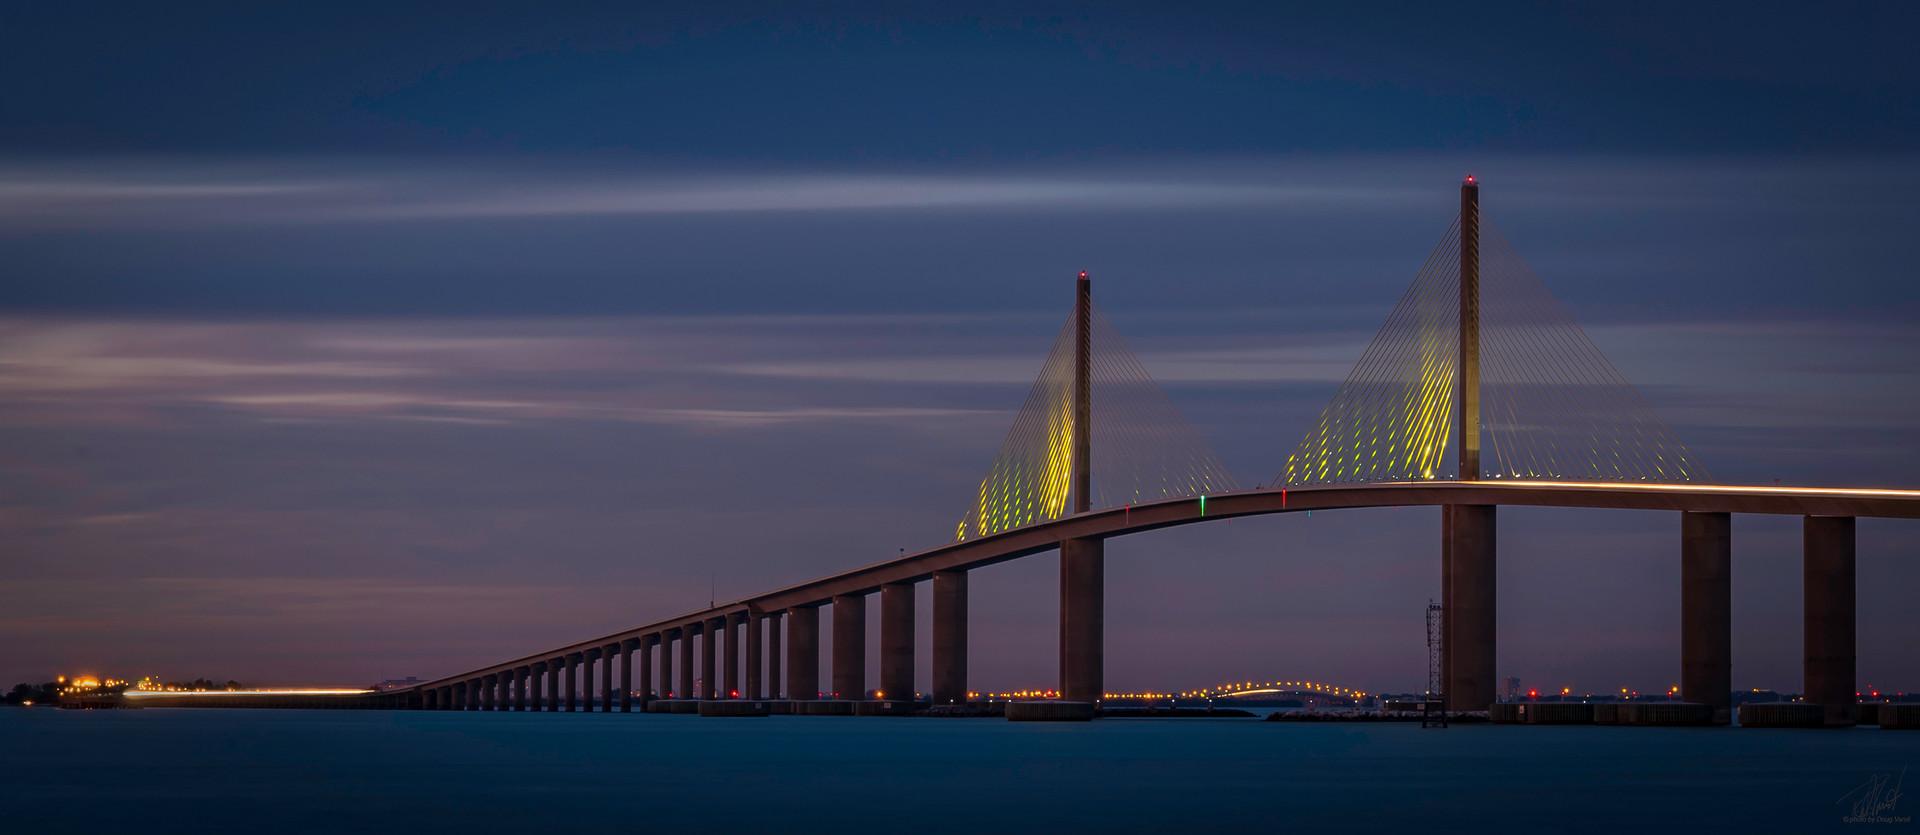 Sunshine Bridge at night